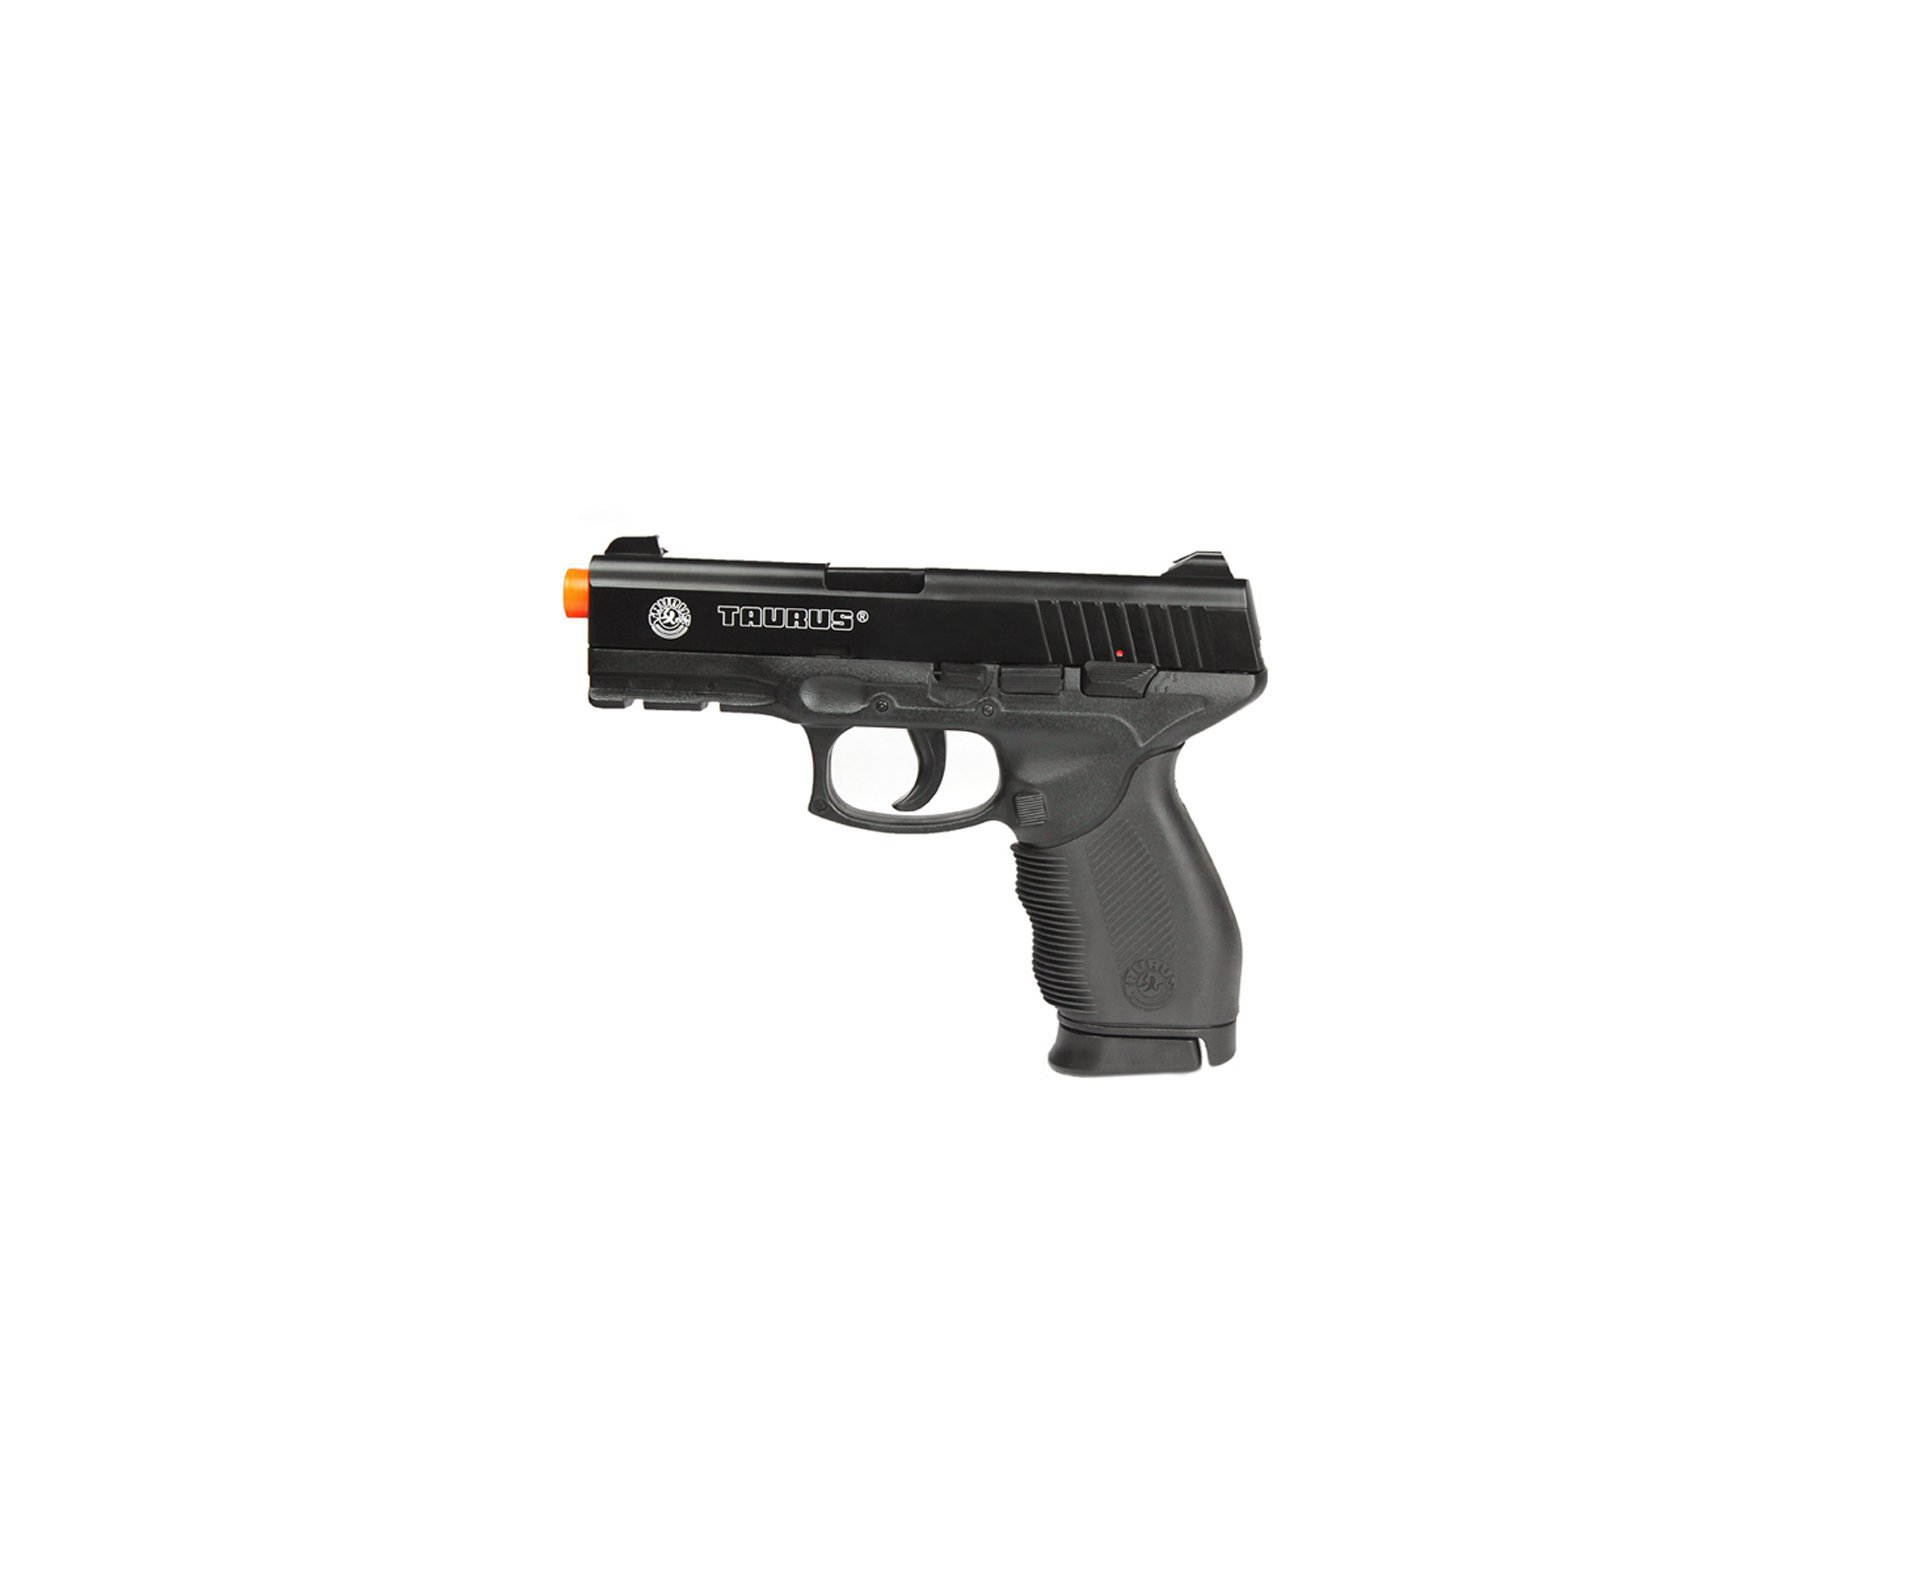 Pistola De Airsoft Taurus Pt 24/7 Semi/metal Cal 6,0 Mm + 4000 Bbs + Maleta Mdc - Cybergun